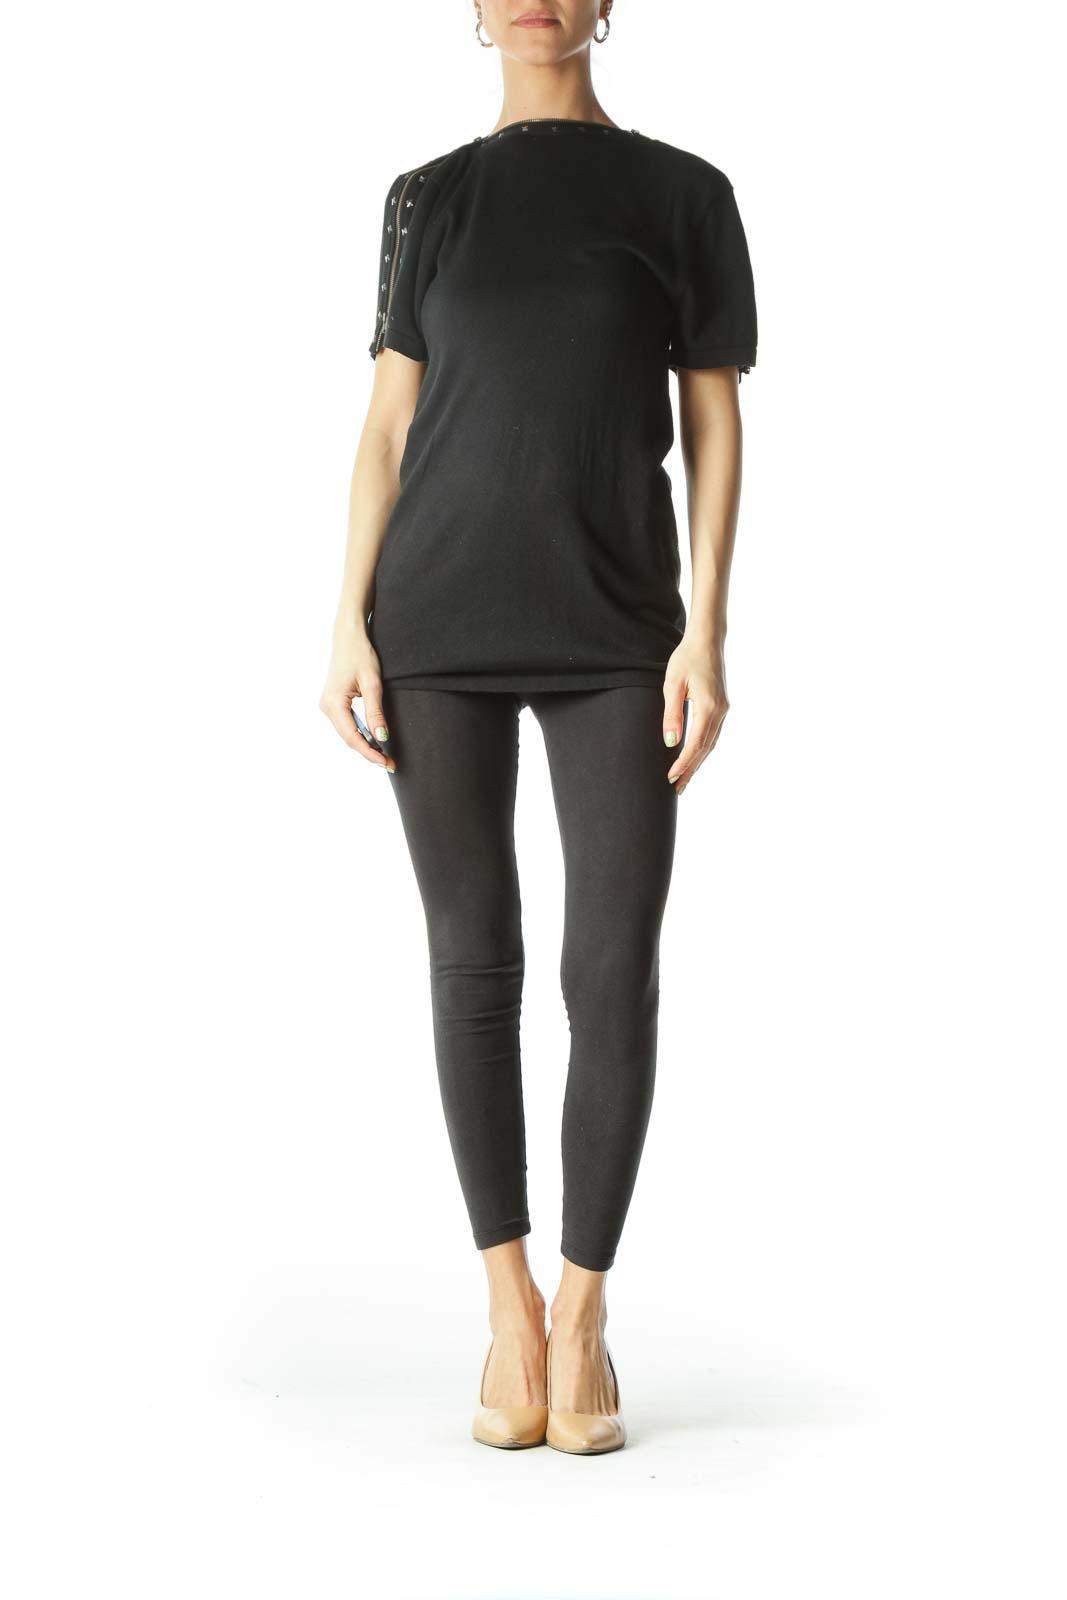 Black Shoulder Zippered Studded Tunic Top